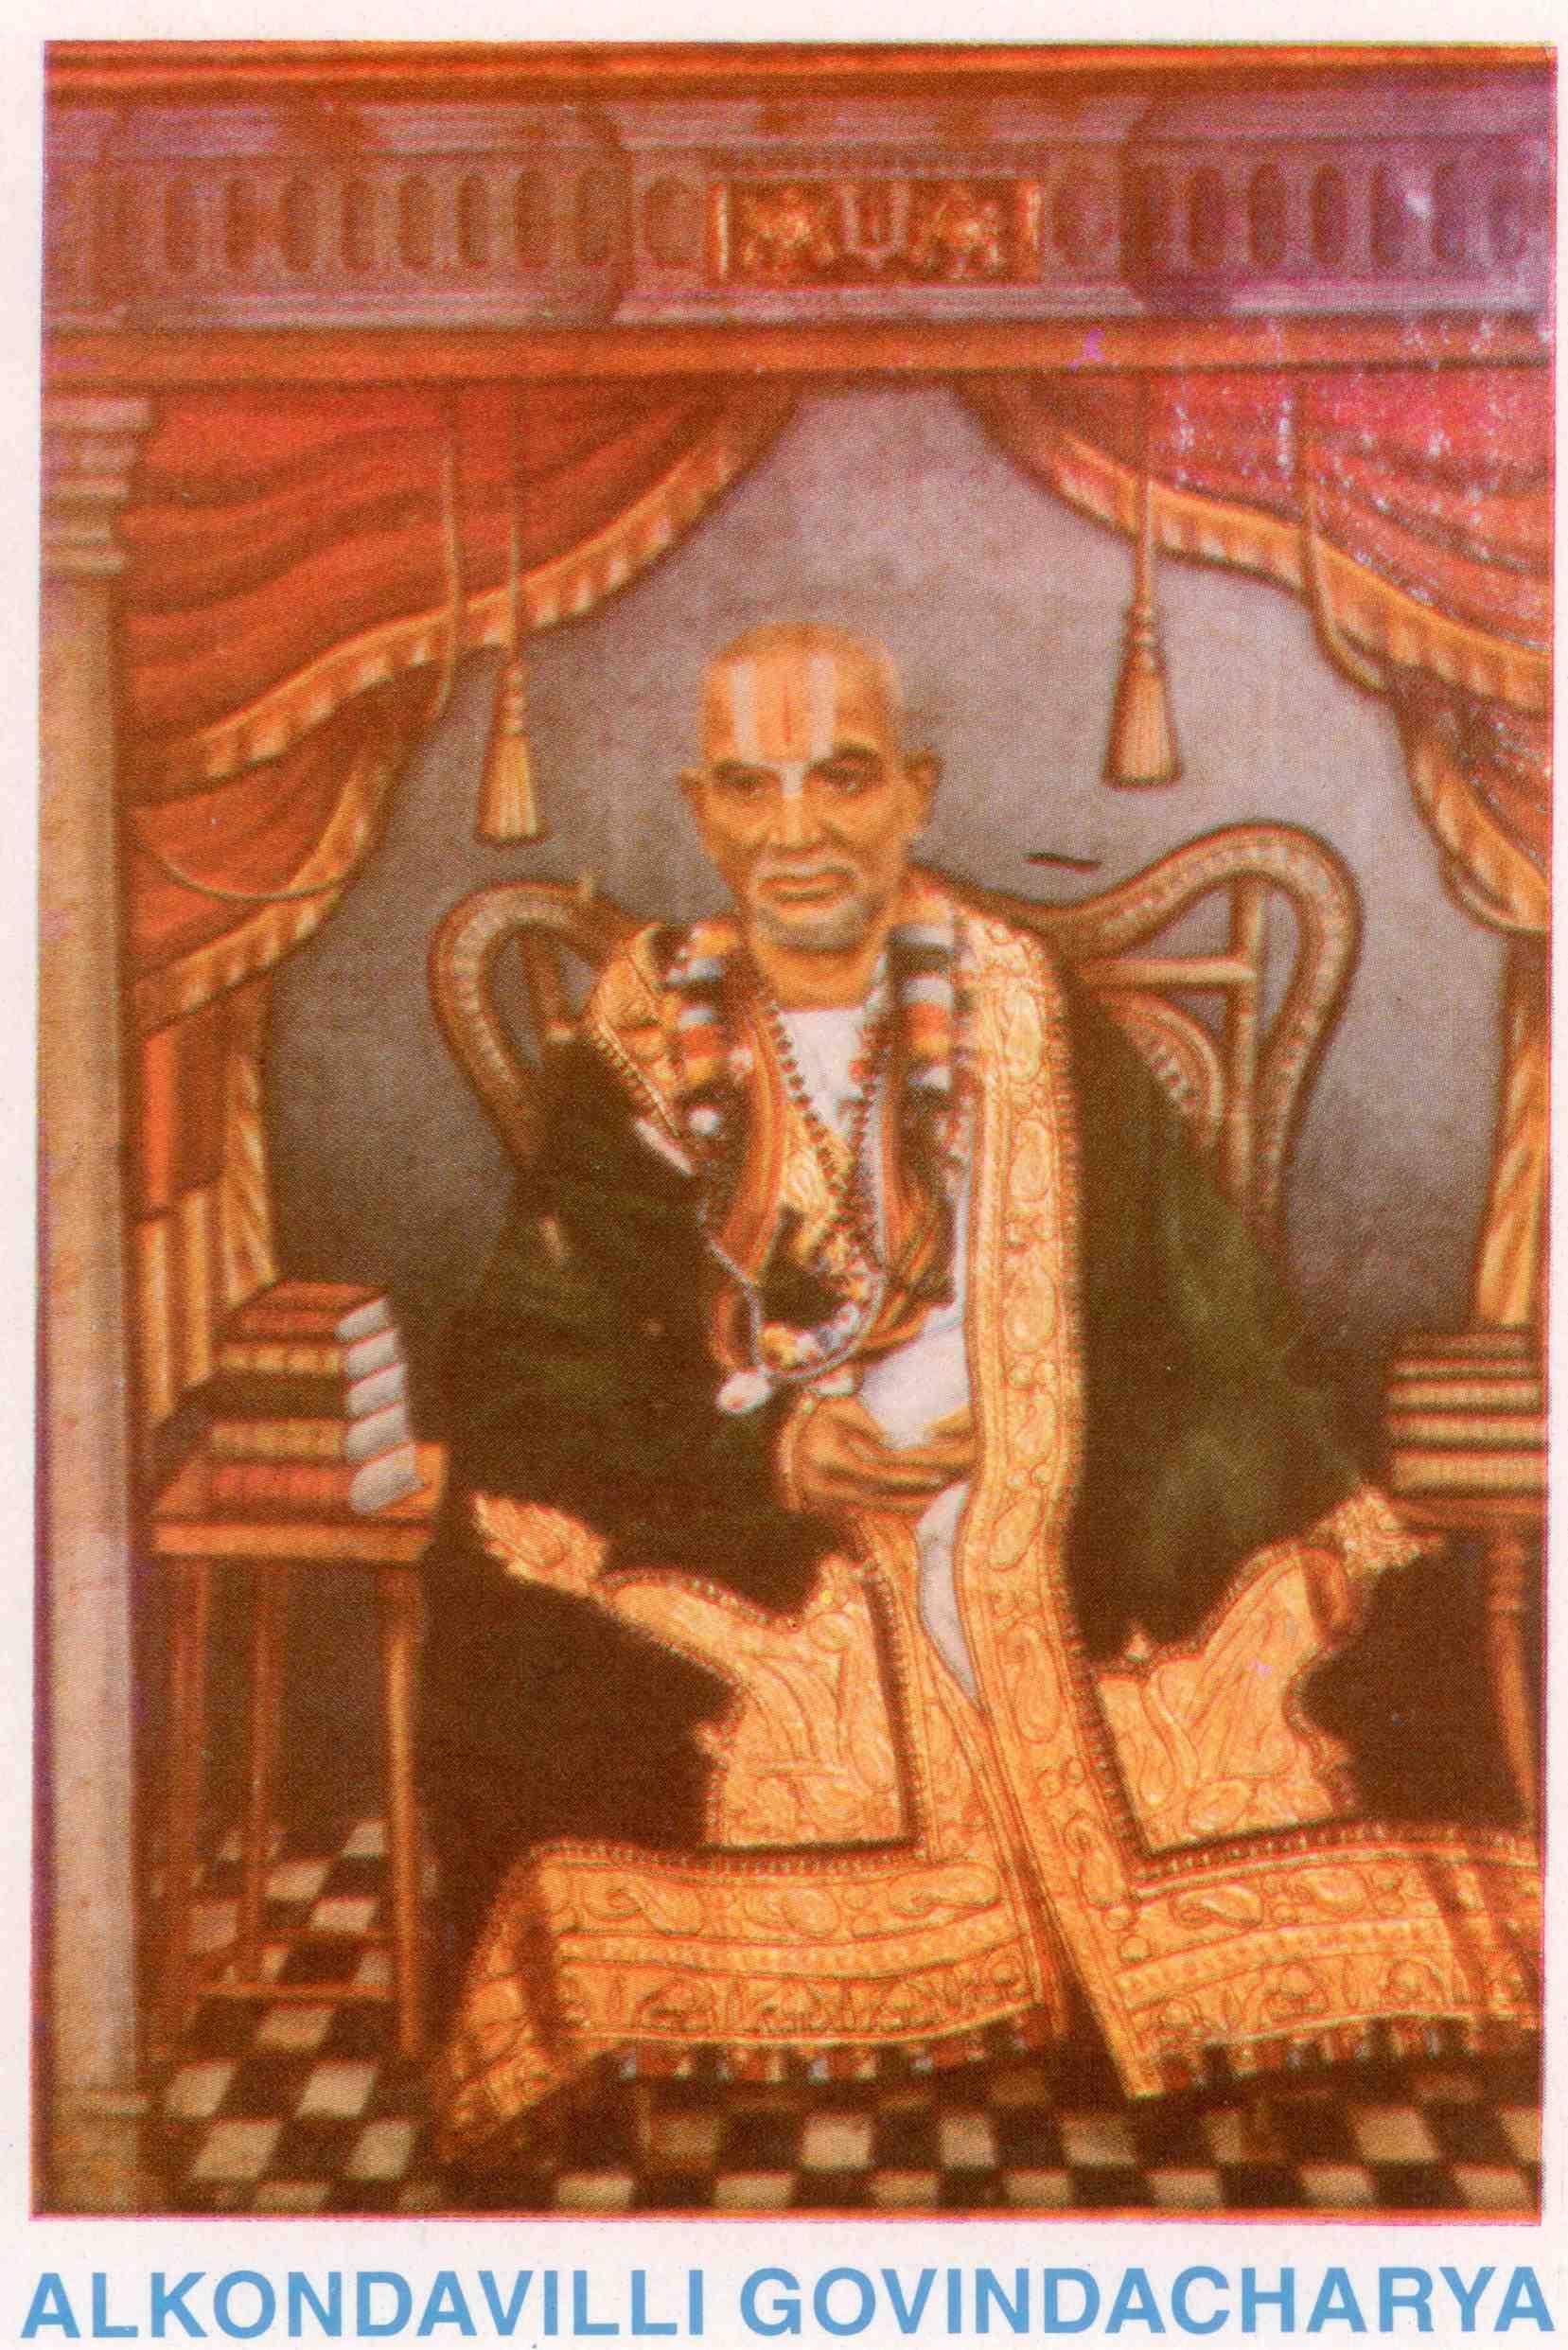 Sri-Alkondavilli-Govindacharya-Swamy-_web